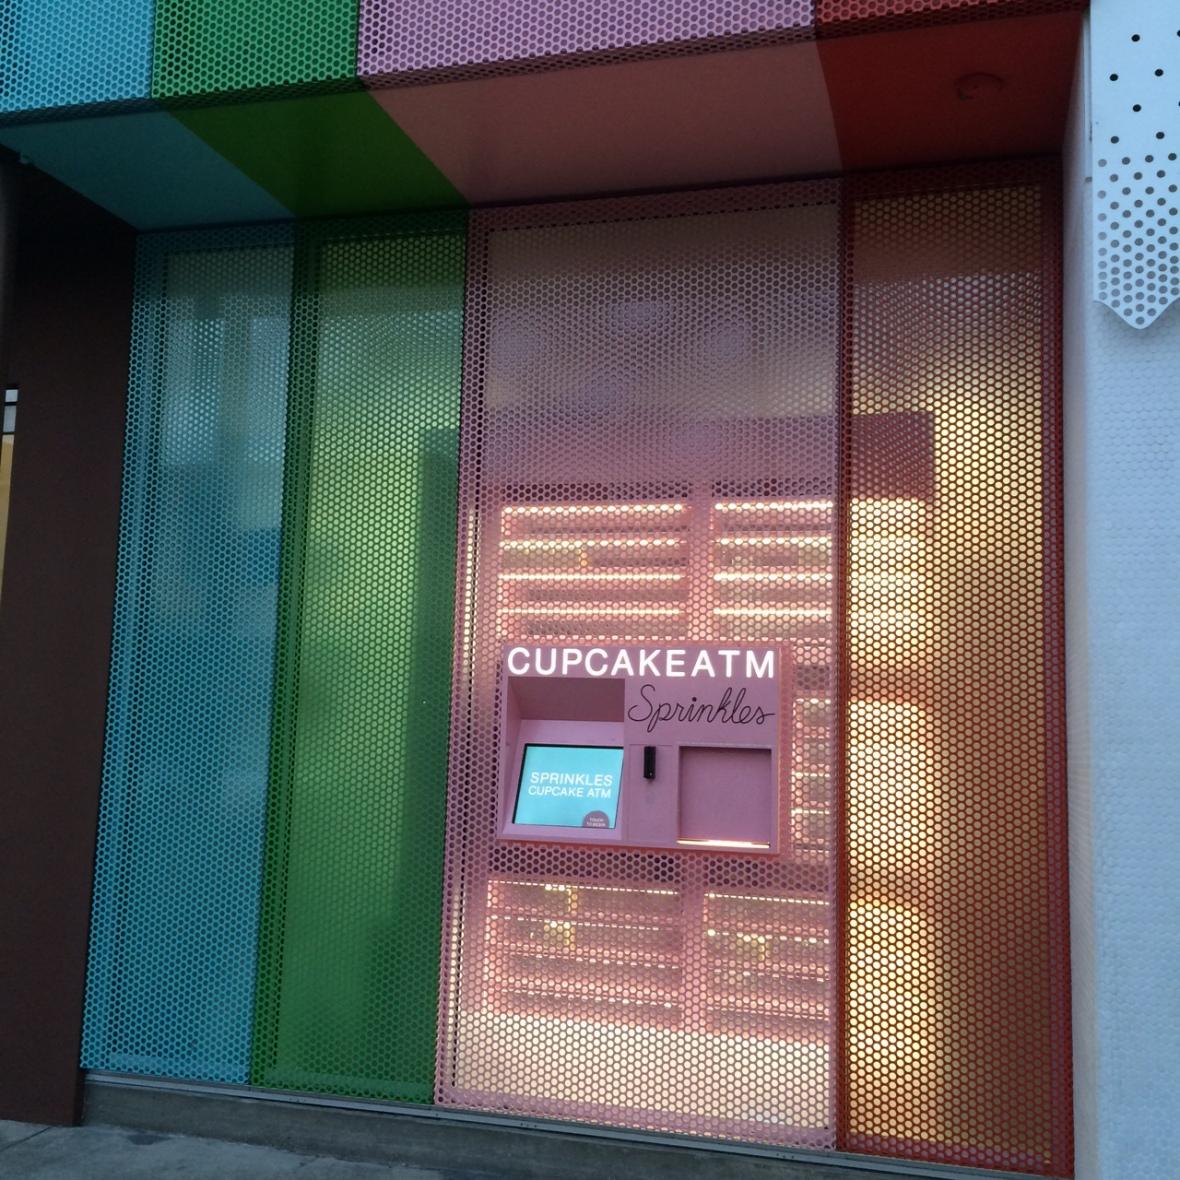 The cupcake ATM at Sprinkles